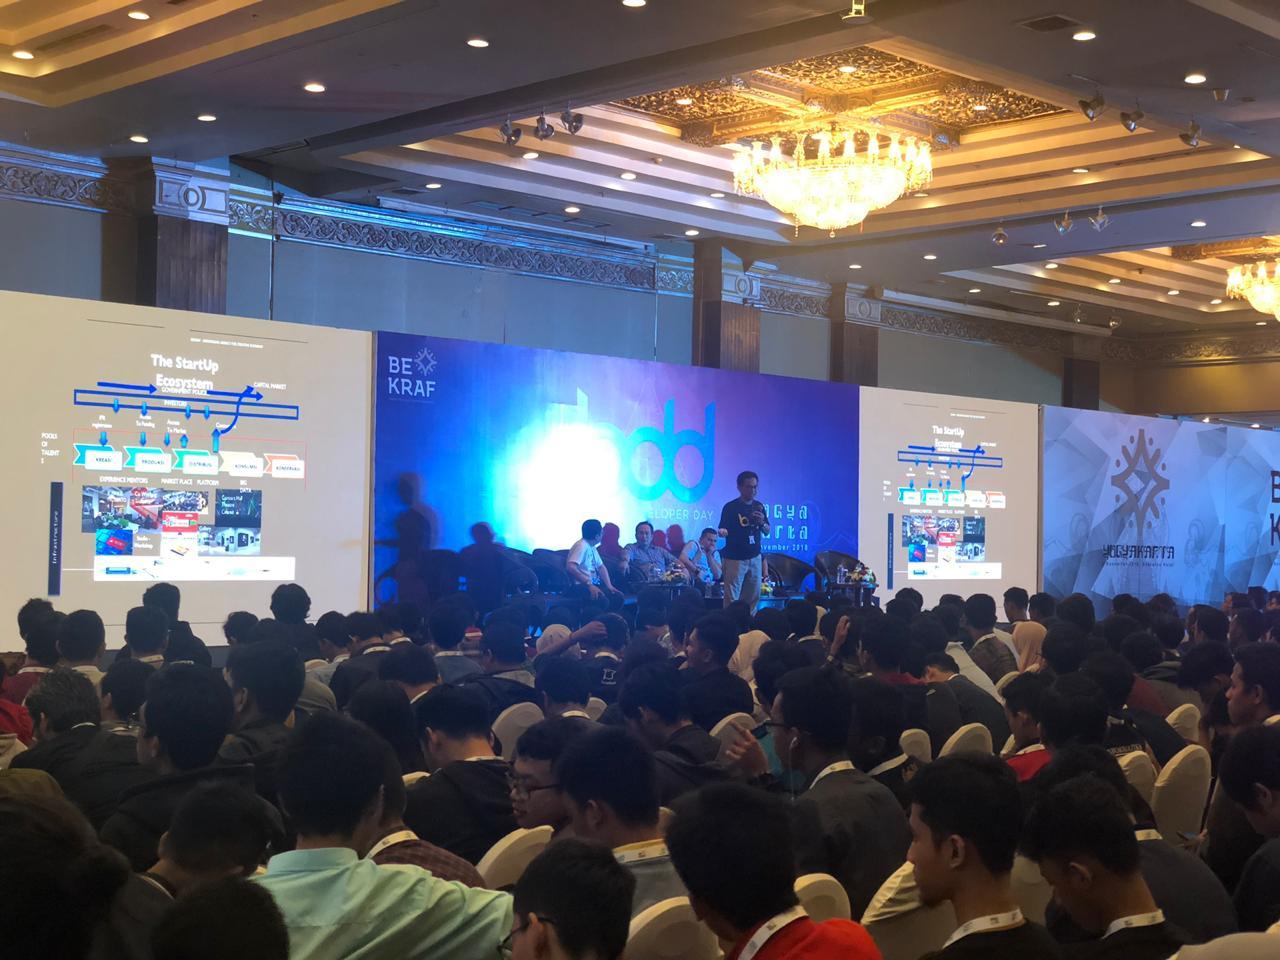 Bekraf Dorong Jogja Menjadi Kota Developer Industri Digital